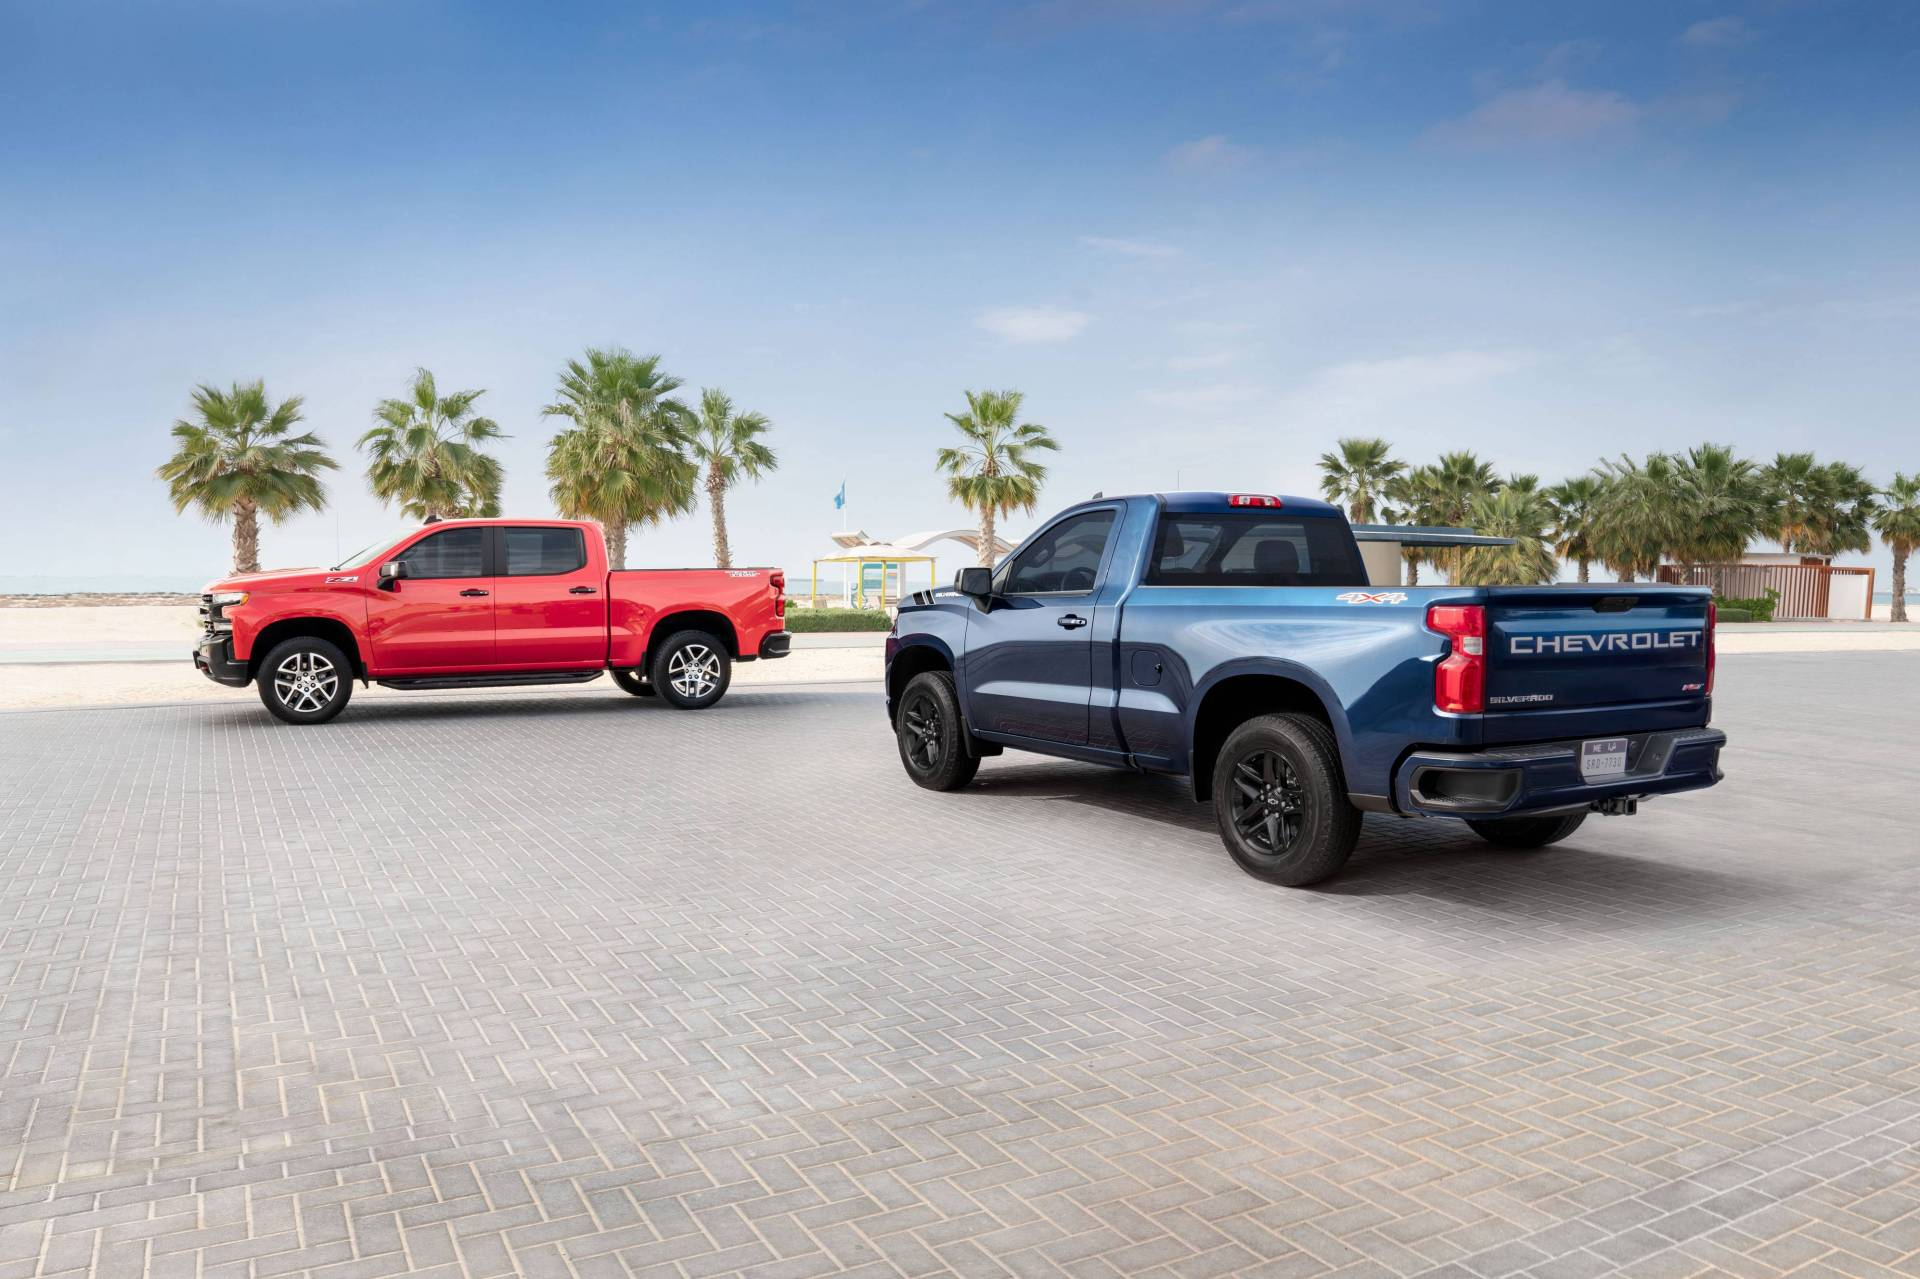 5 Chevrolet Silverado 5 ZRX Off-Road Truck To Feature DSSV